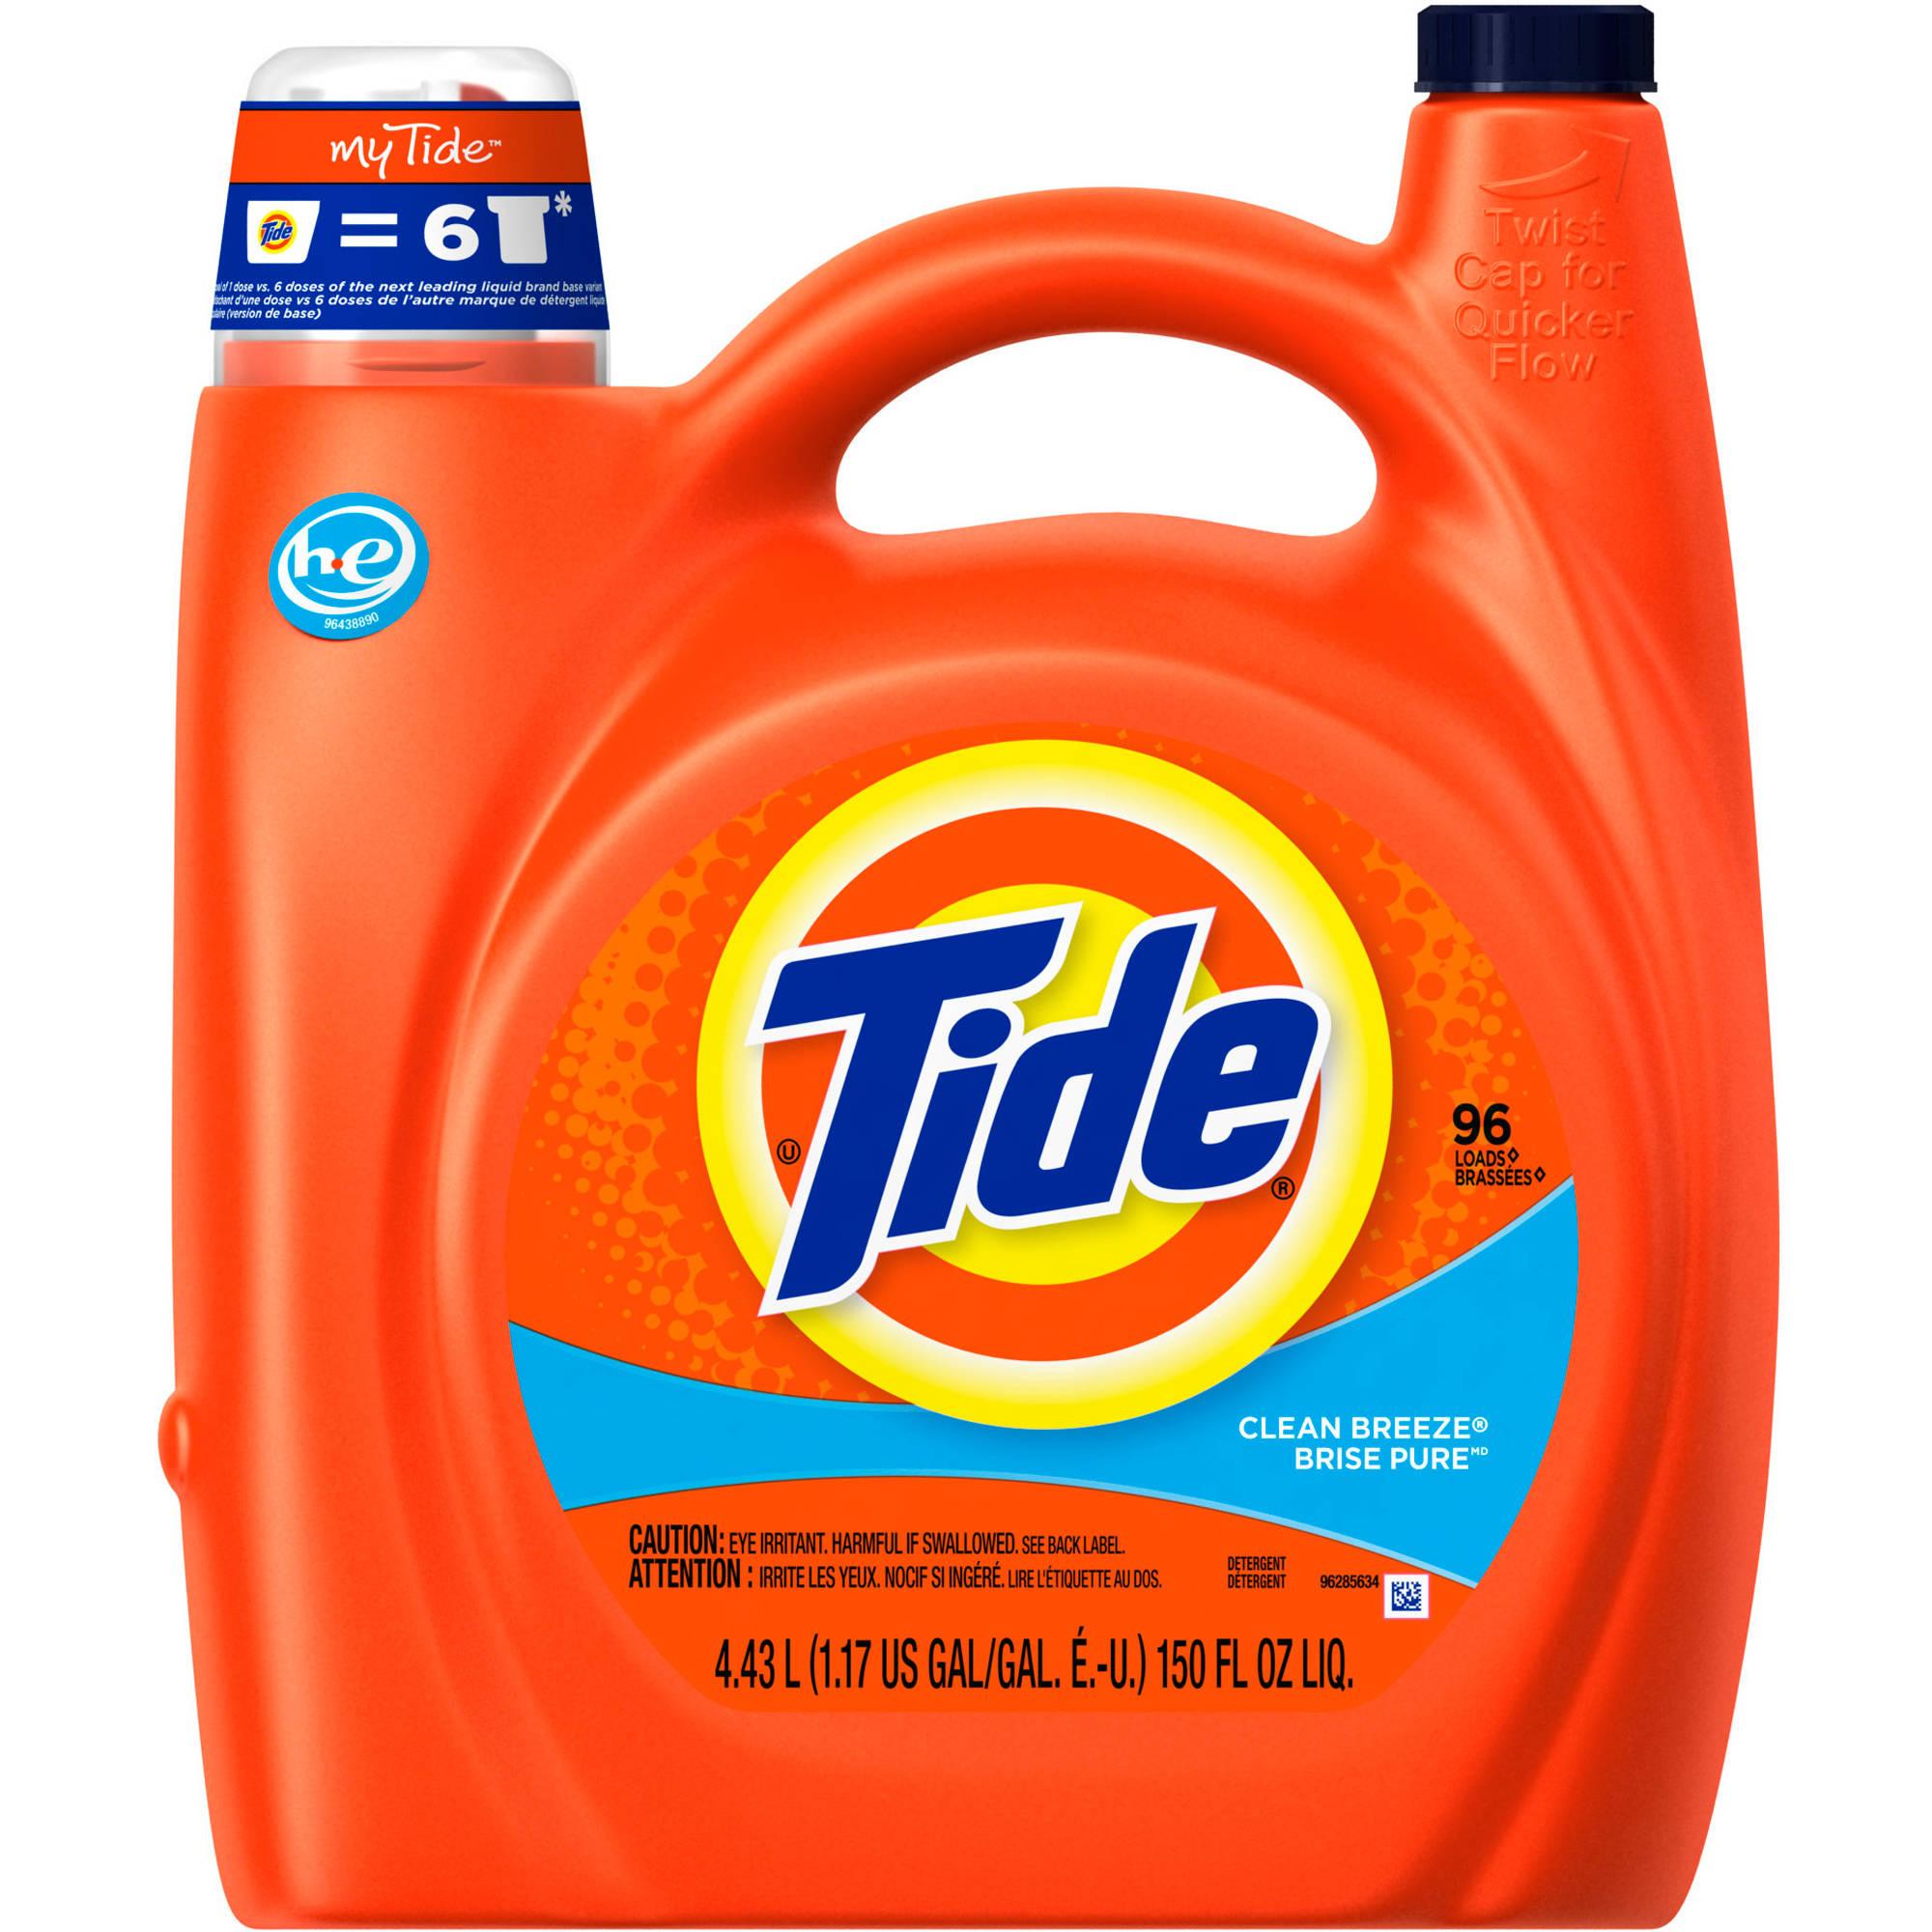 Tide Clean Breeze Scent HE Turbo Clean Liquid Laundry Detergent, 96 Loads 150 oz